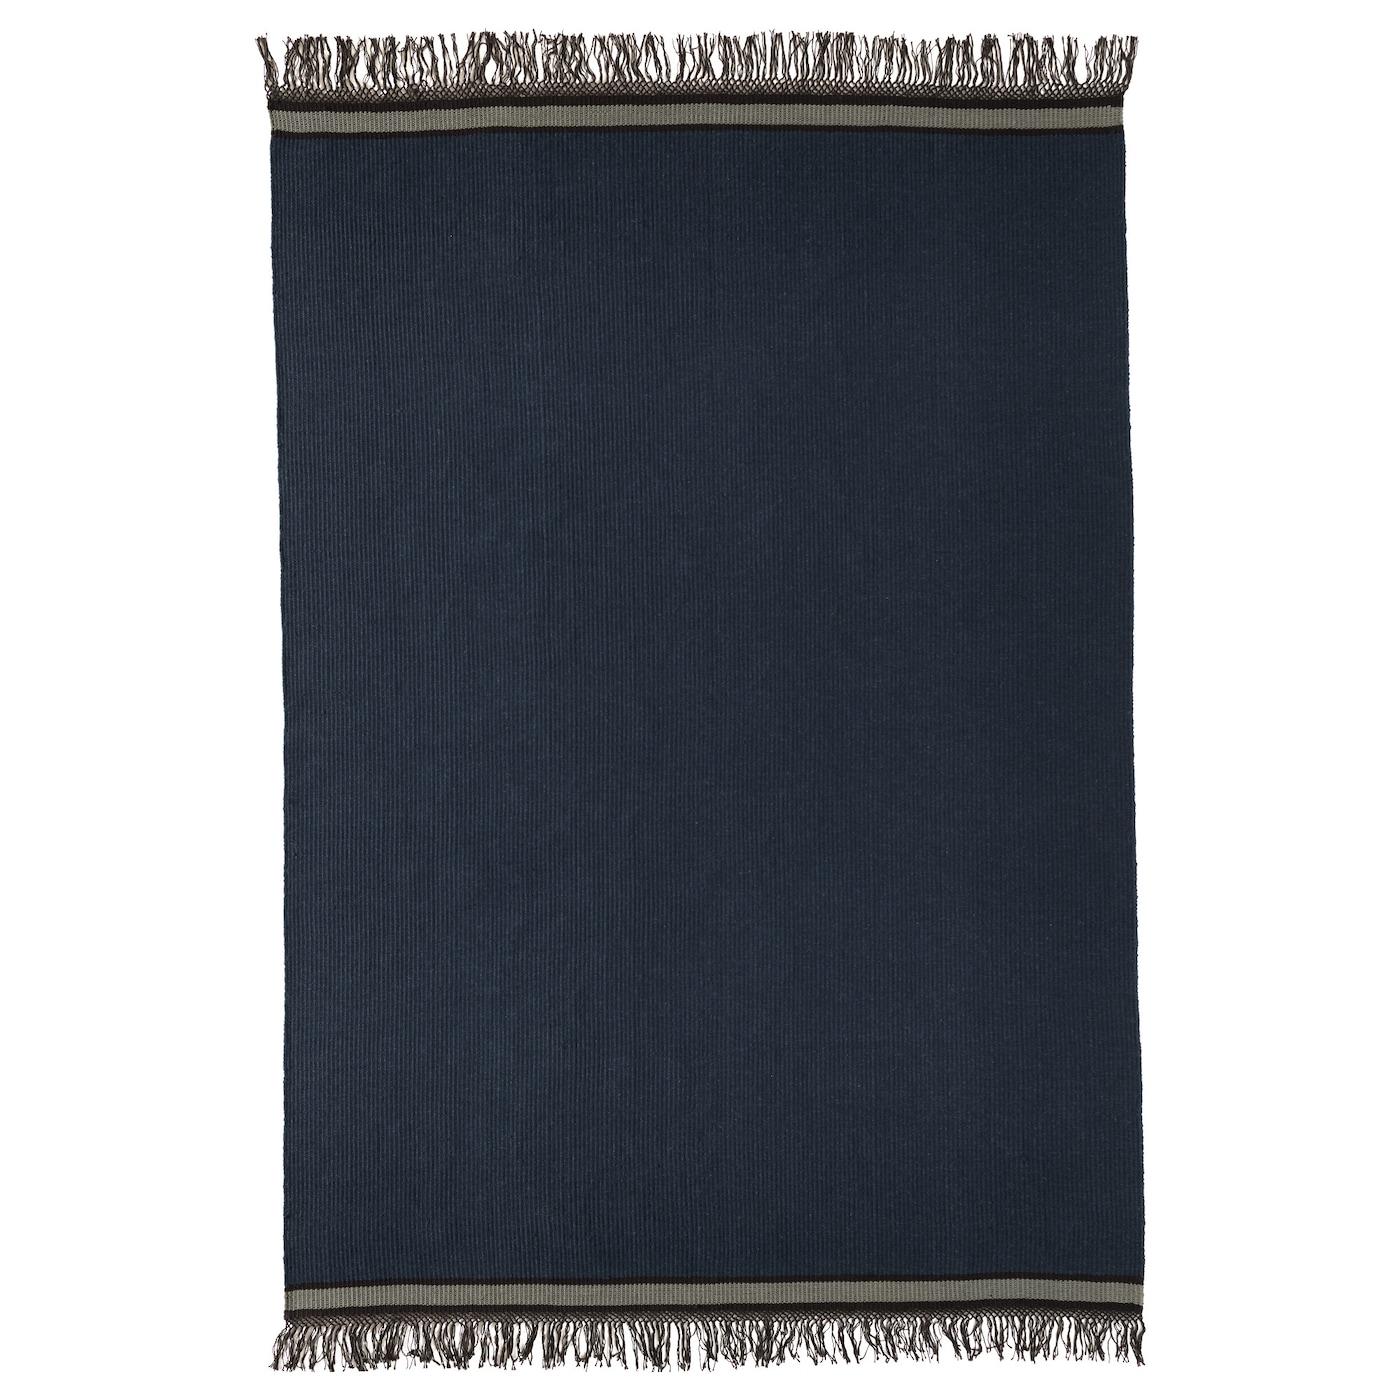 Stockholm 2017 rug flatwoven handmade blue 170x240 cm ikea - Alfombra yute ikea ...